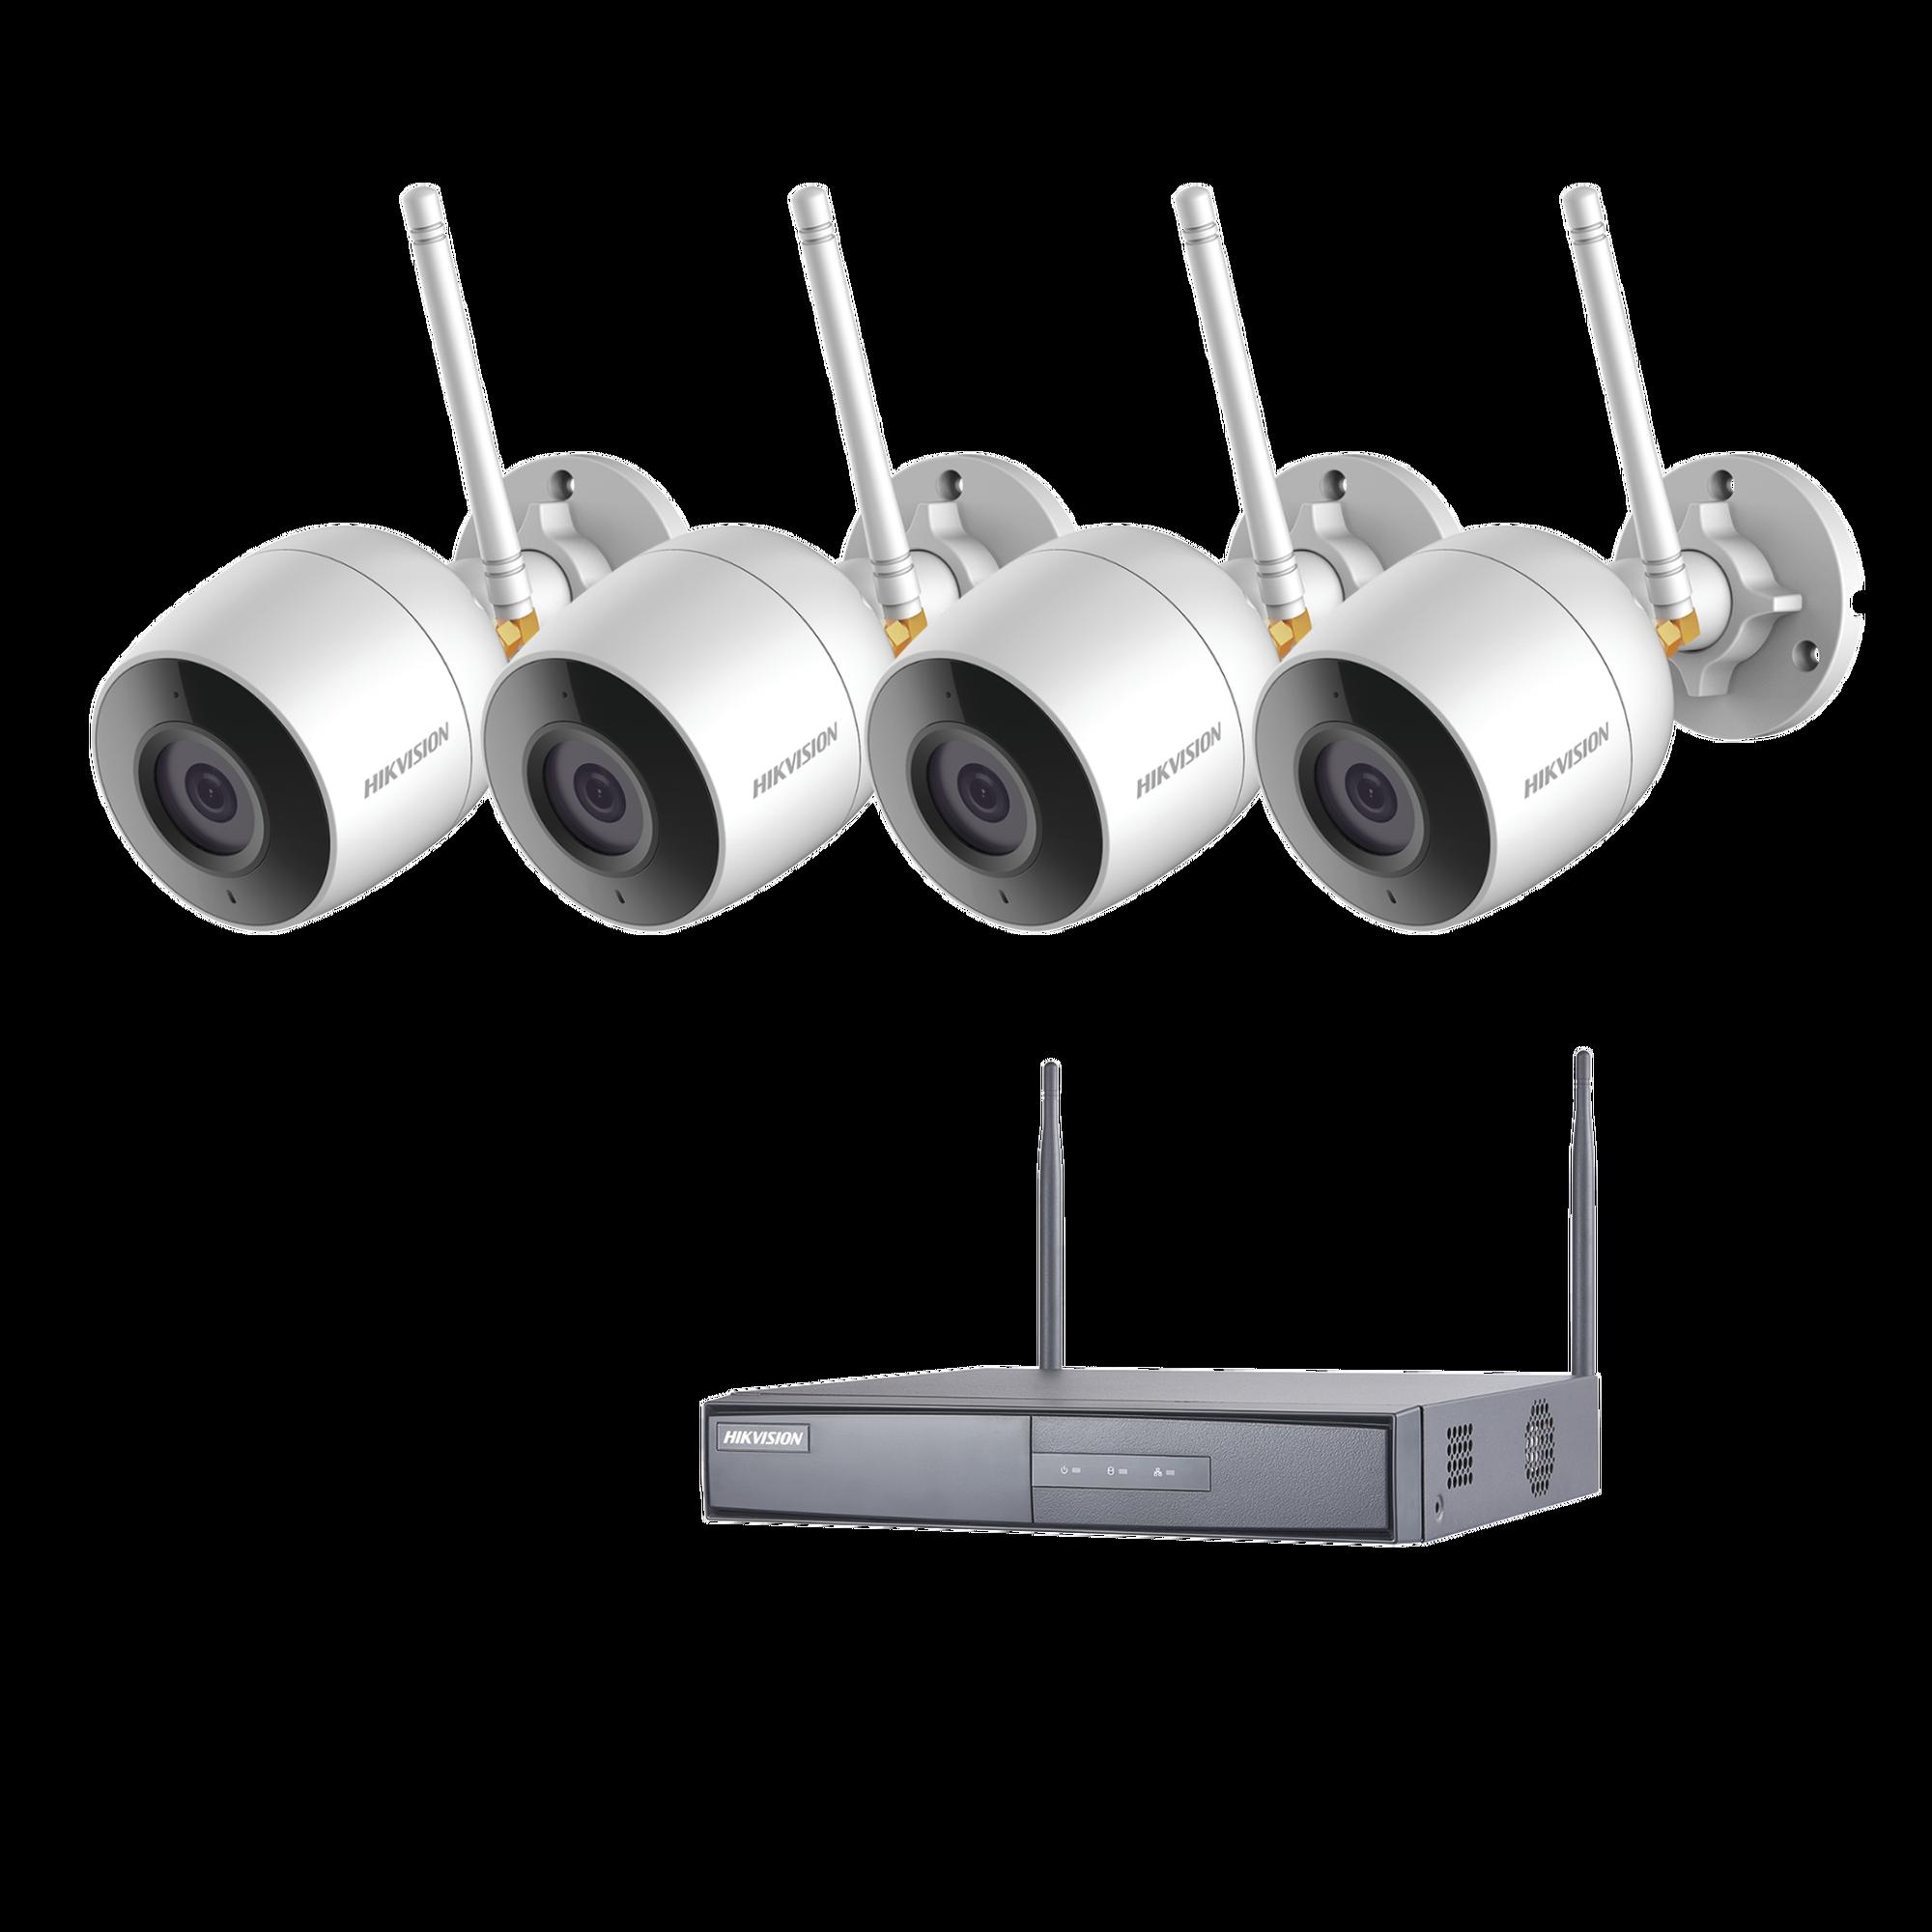 Sistema IP Inalambrico 1080p / NVR 4 Canales / 4 Cámaras bala (exterior IP66) con micrófono interconstruido